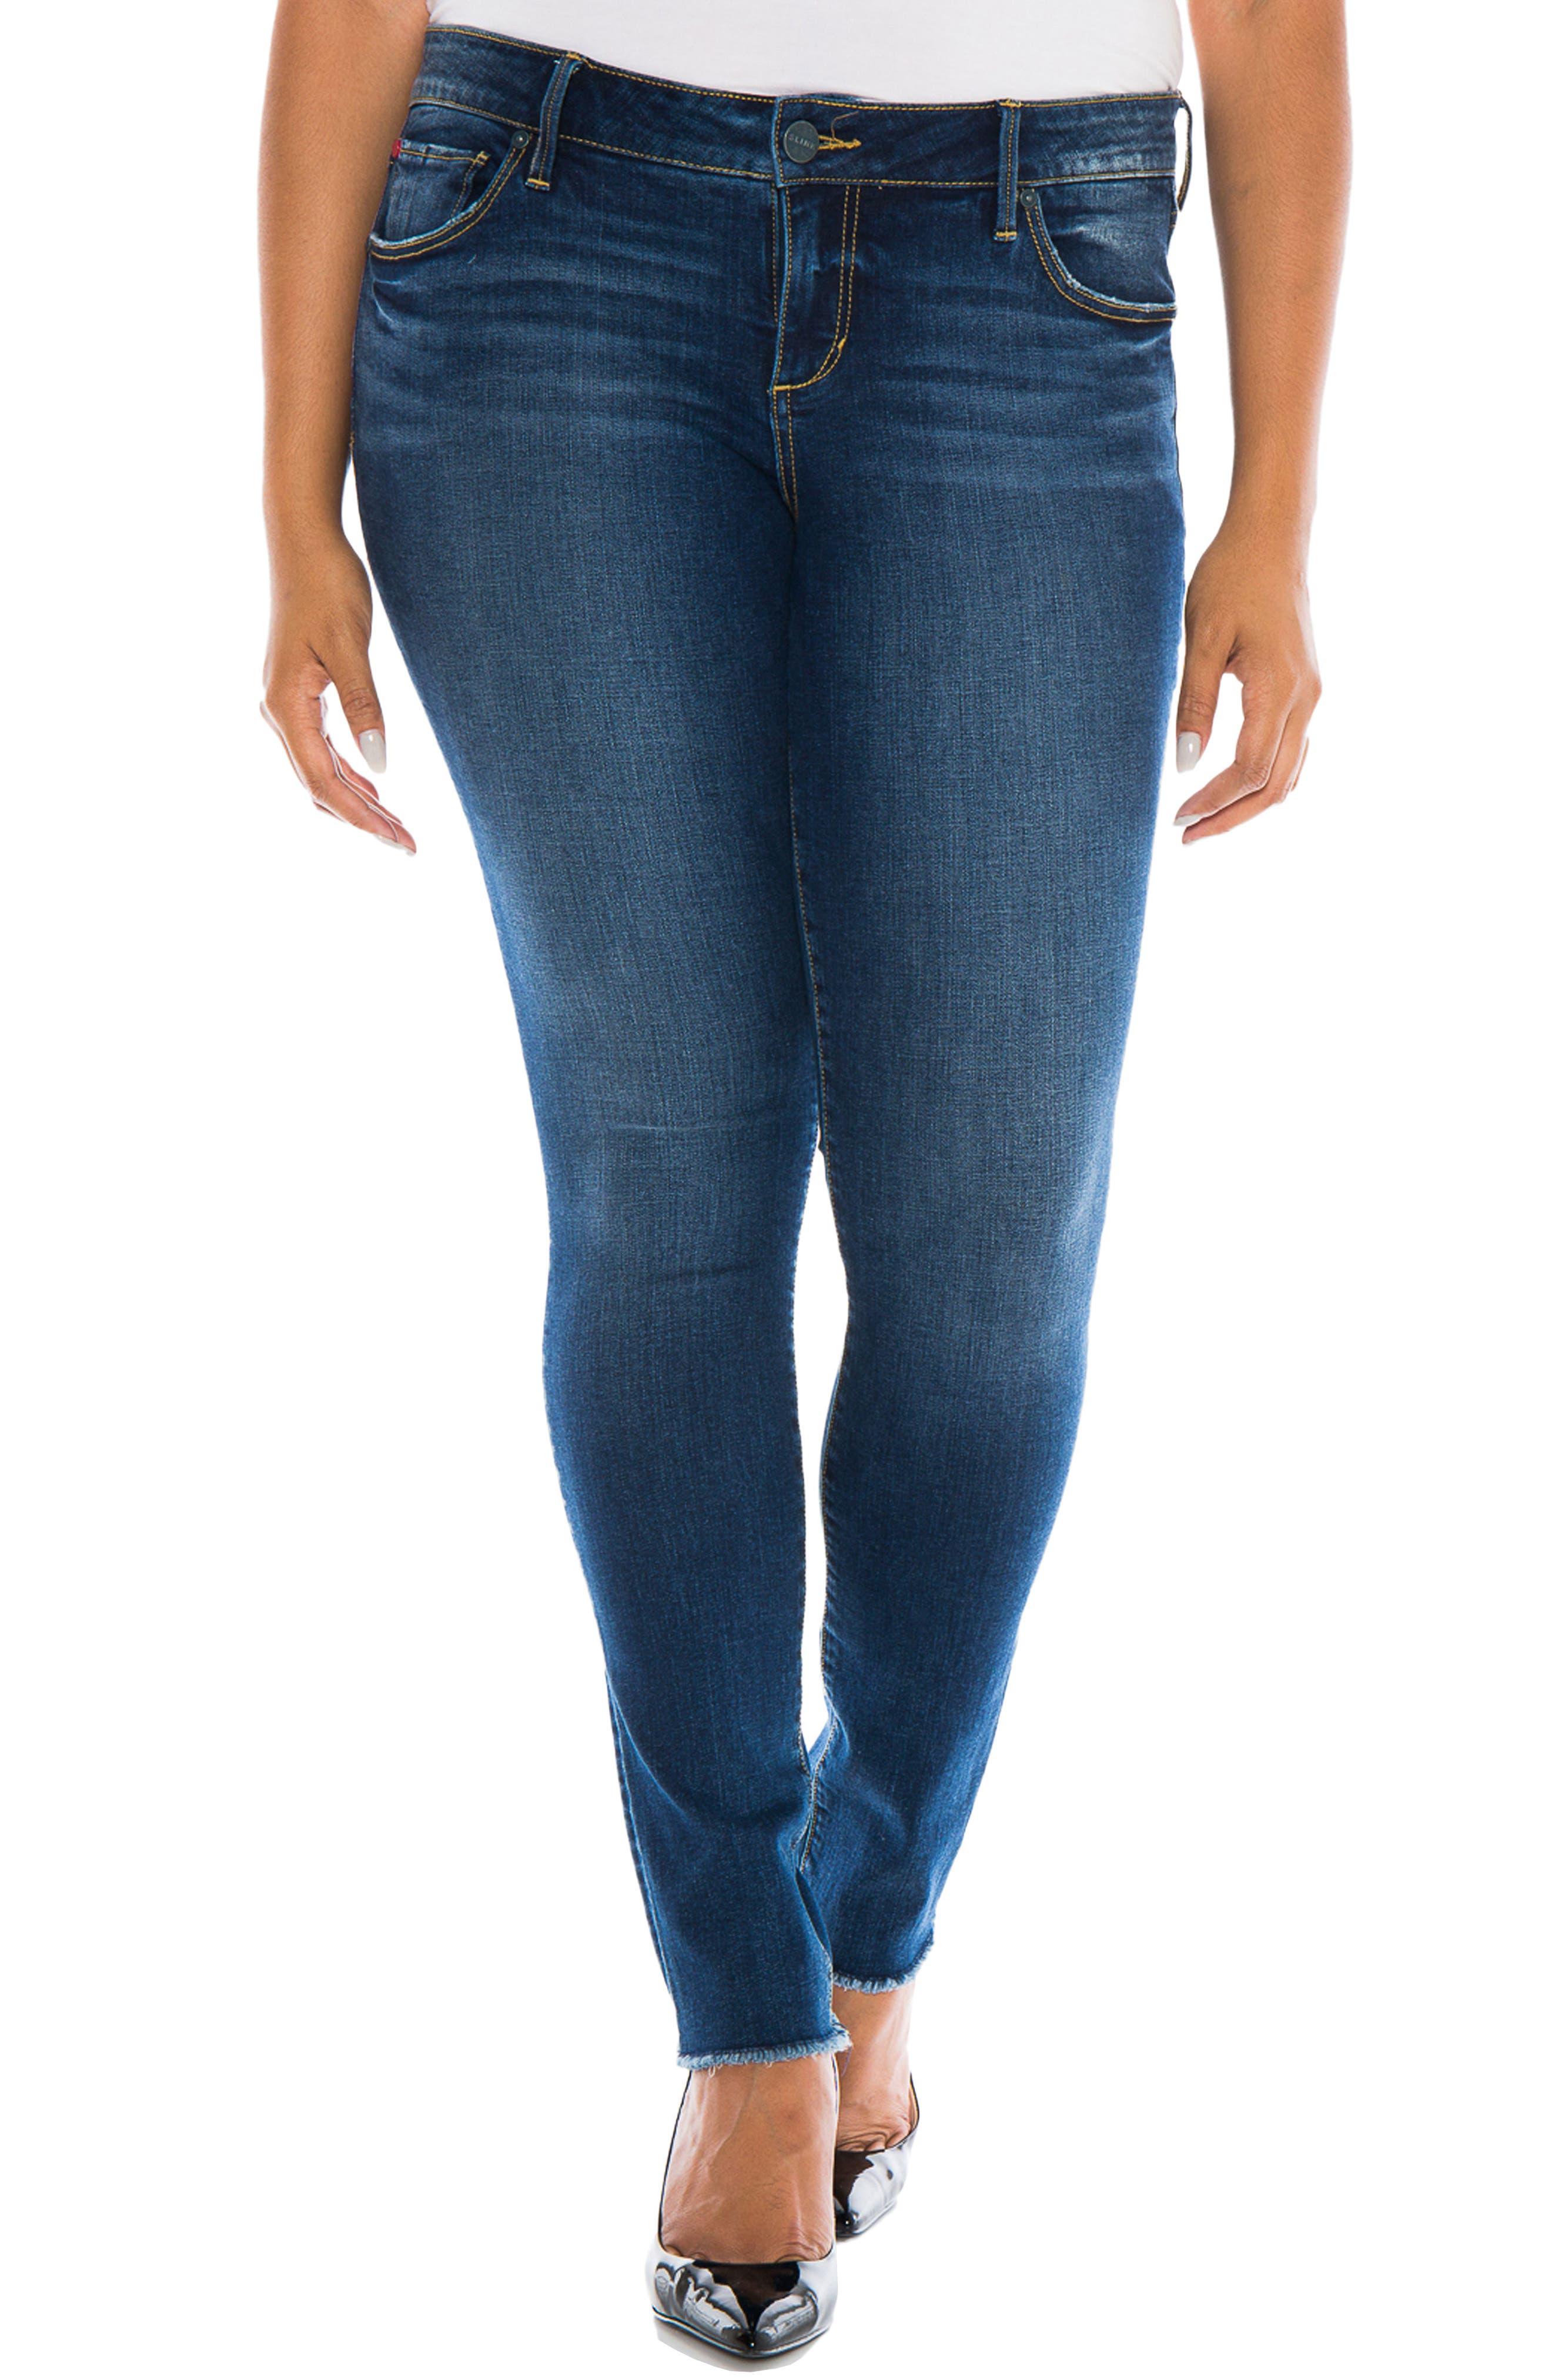 Main Image - SLINK Jeans Raw Hem Skinny Jeans (Charvelle) (Plus Size)